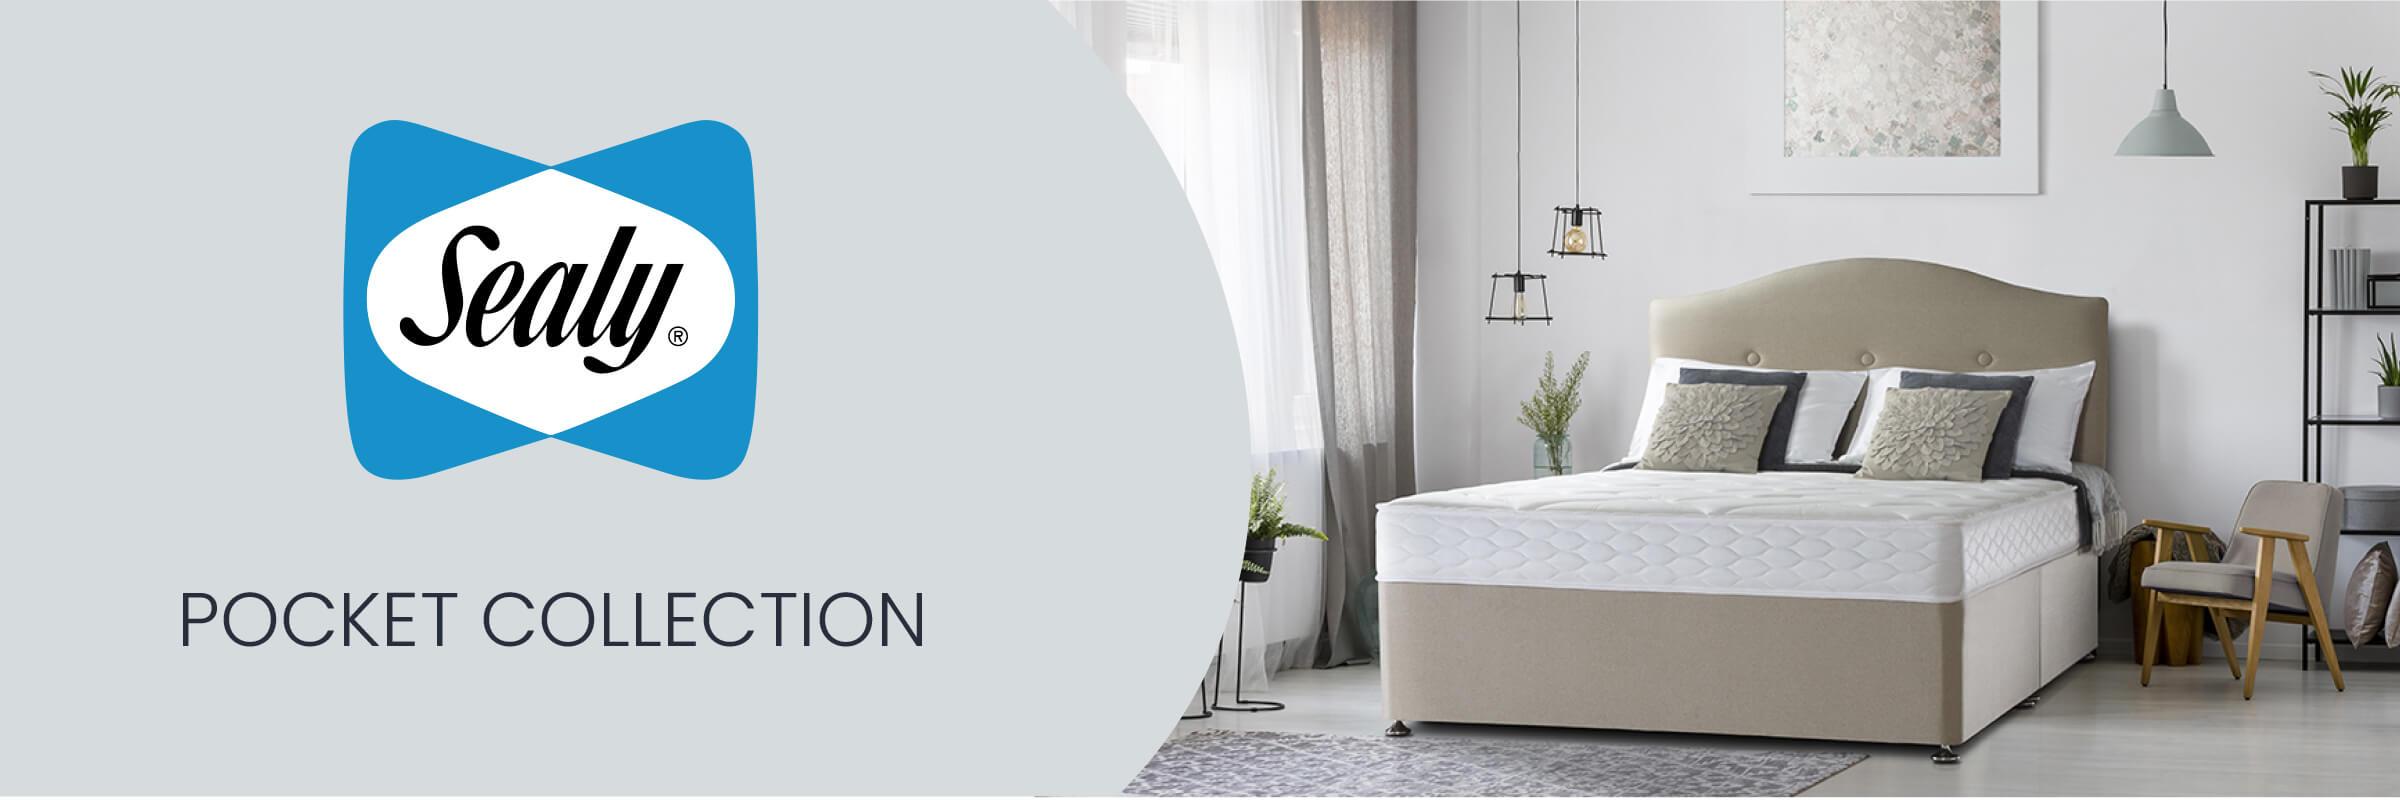 Sealy Posturepedic Pocket Collection mattresses and divan beds at Mattress Online